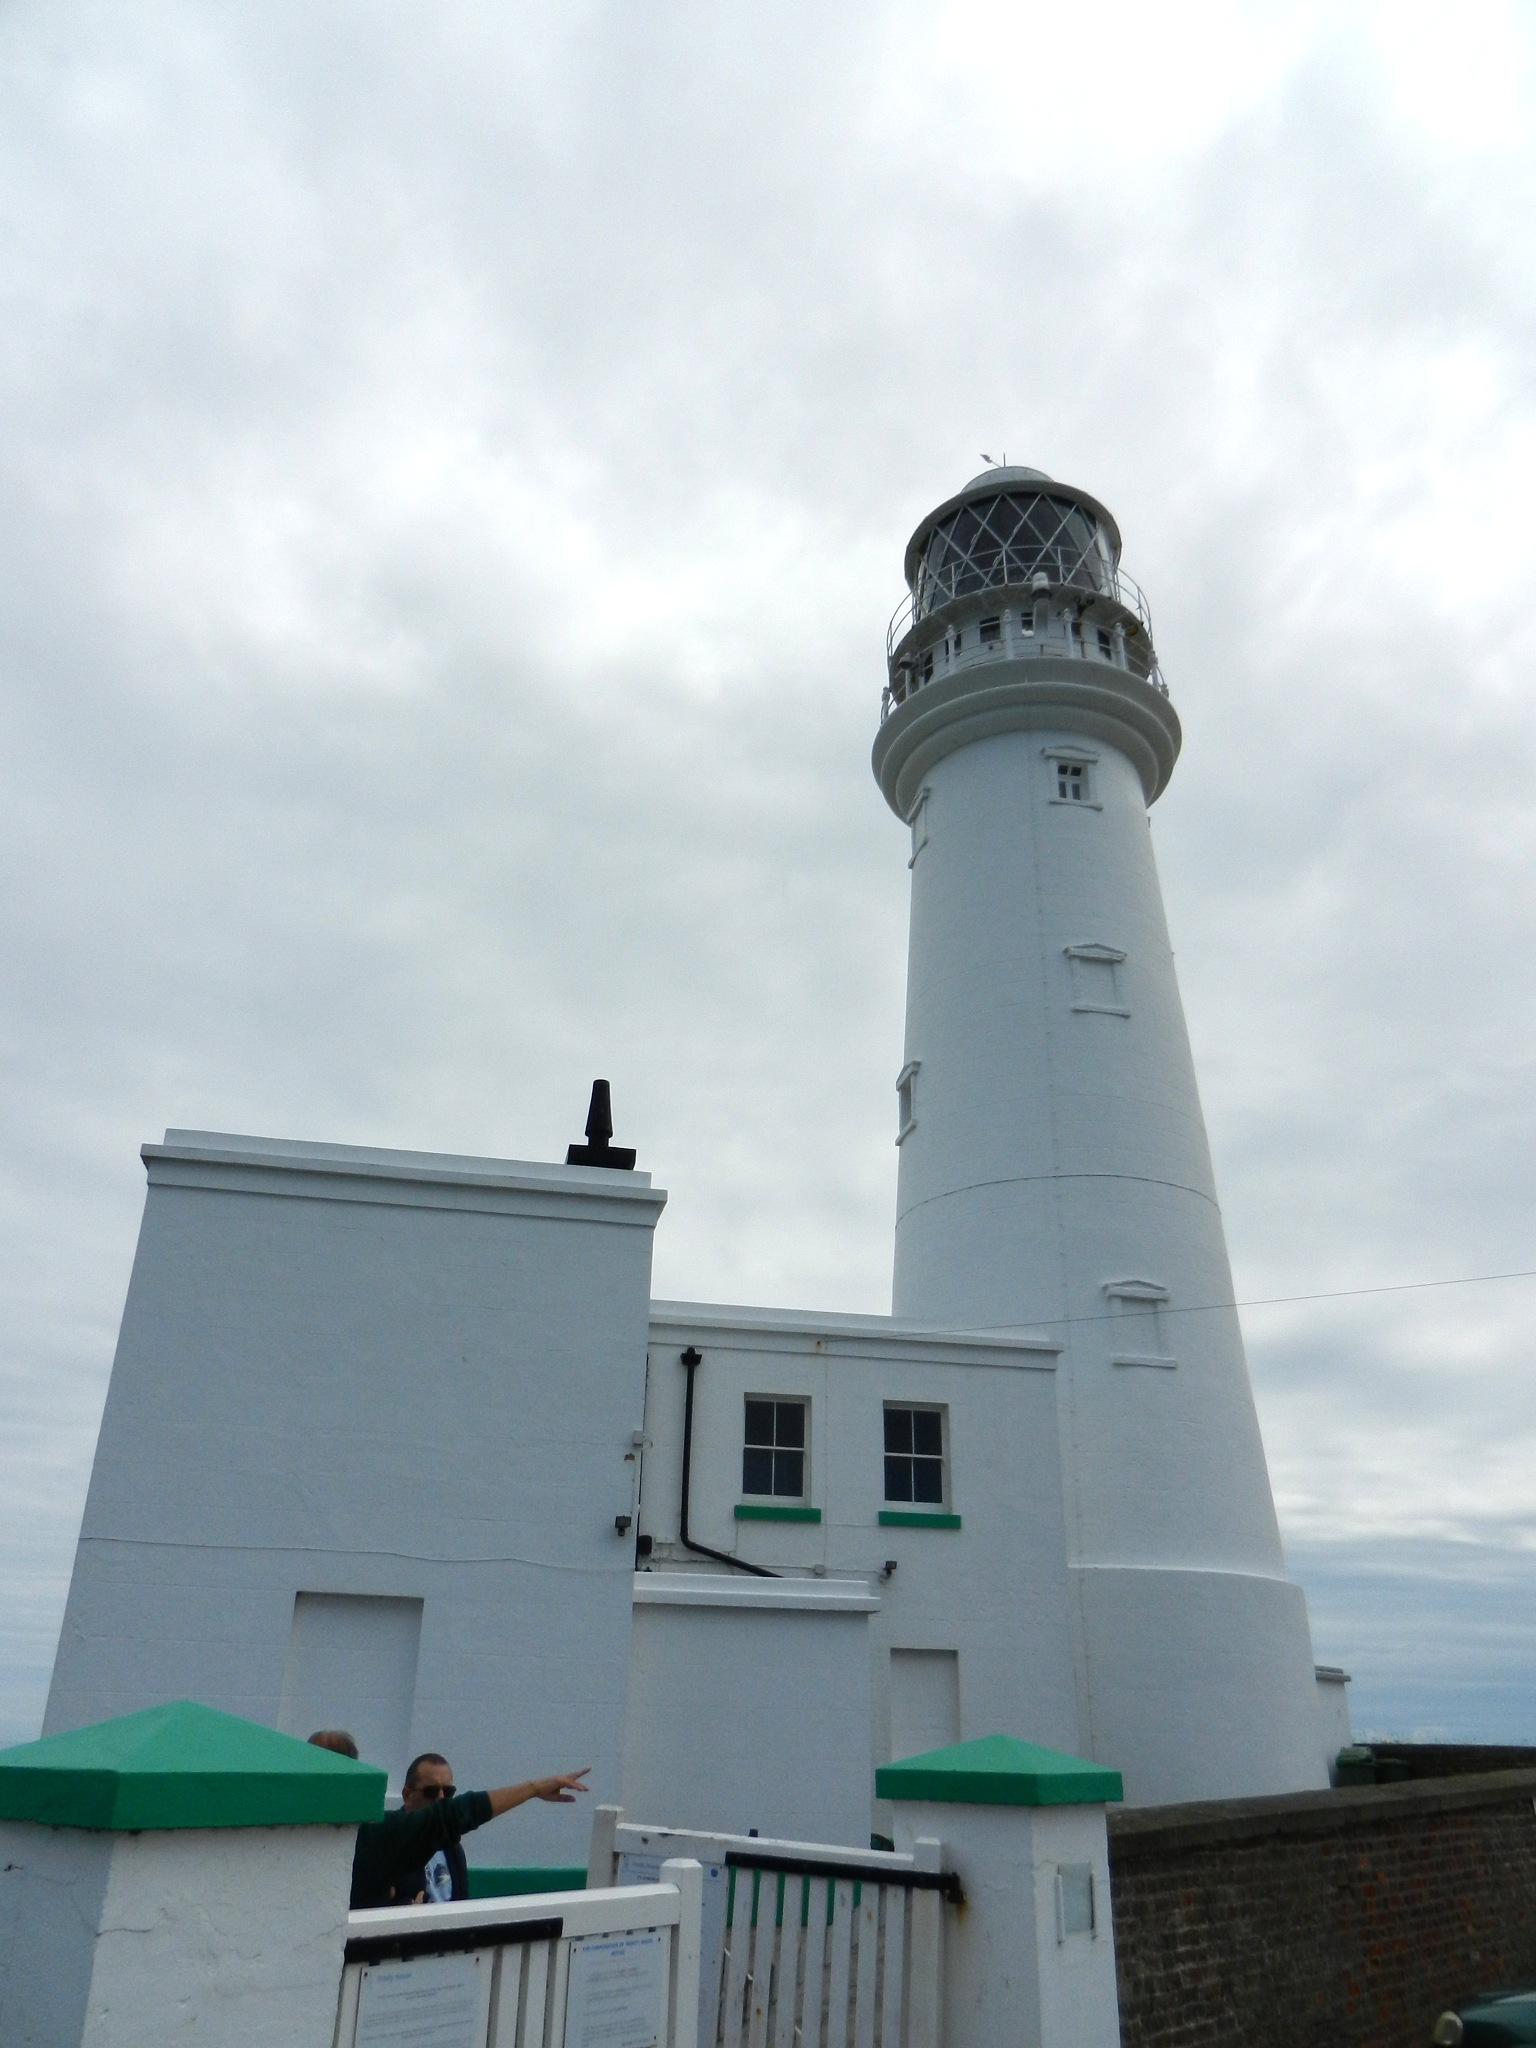 Flamborough lighthouse by rob.lloyd.3954